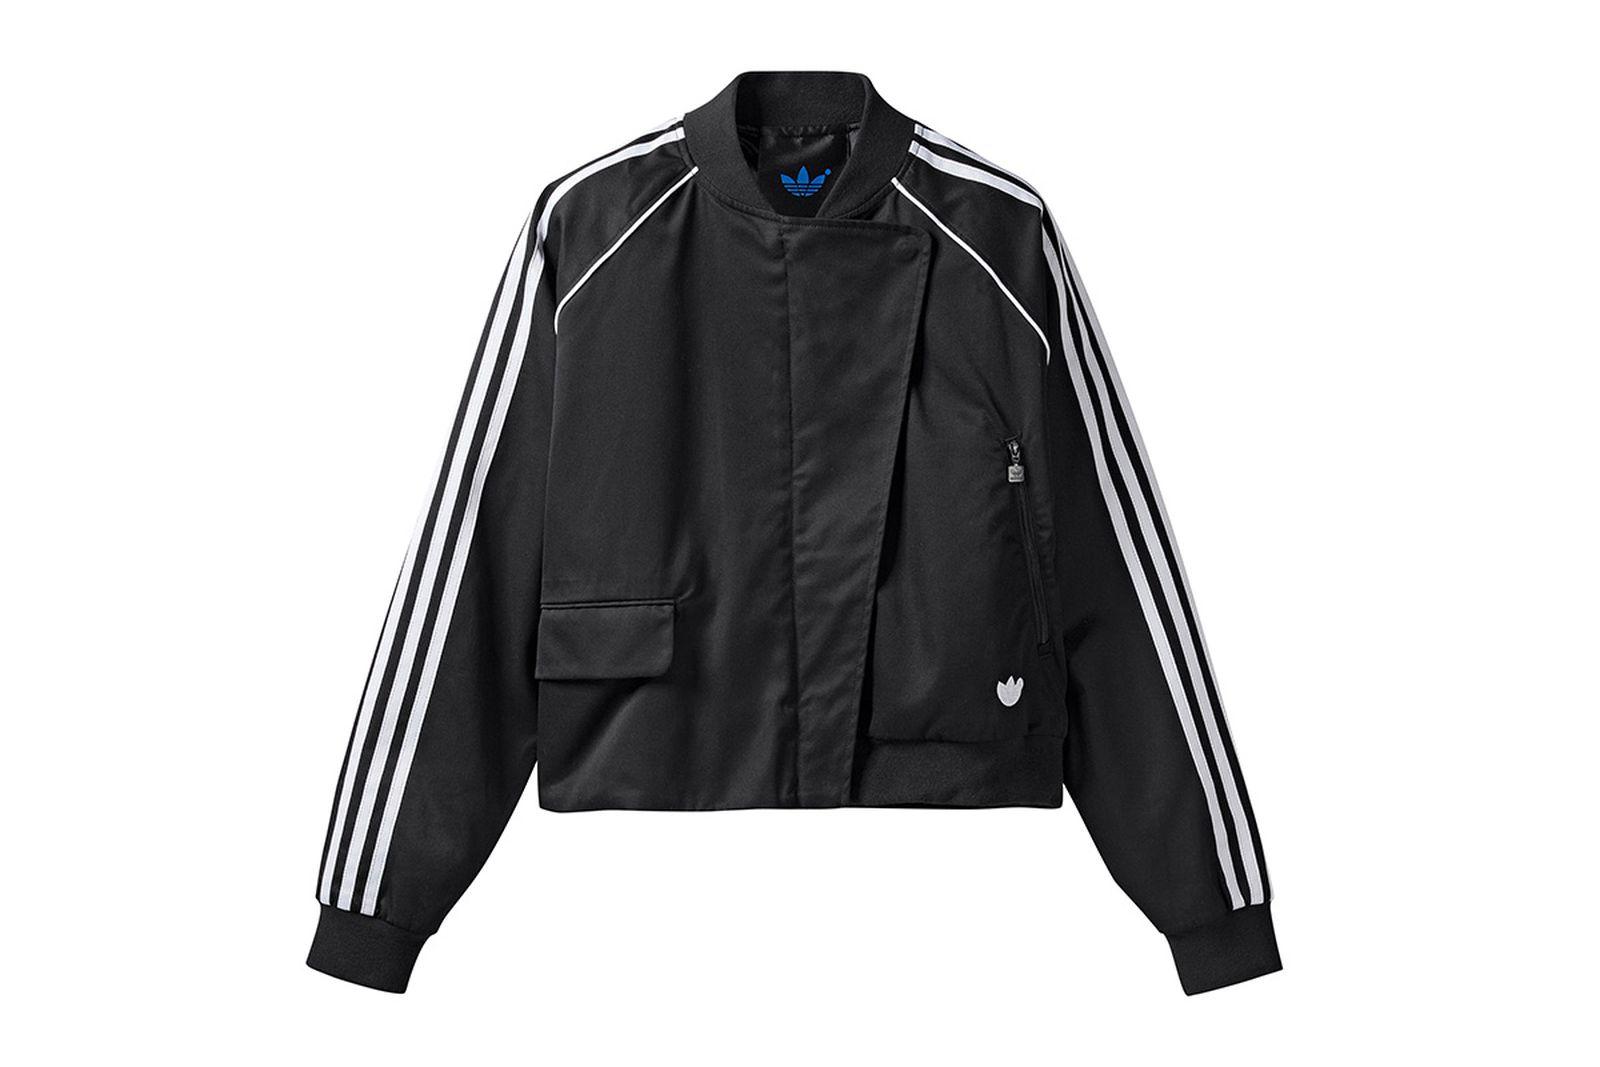 adidas-originals-blue-version-release-info-25